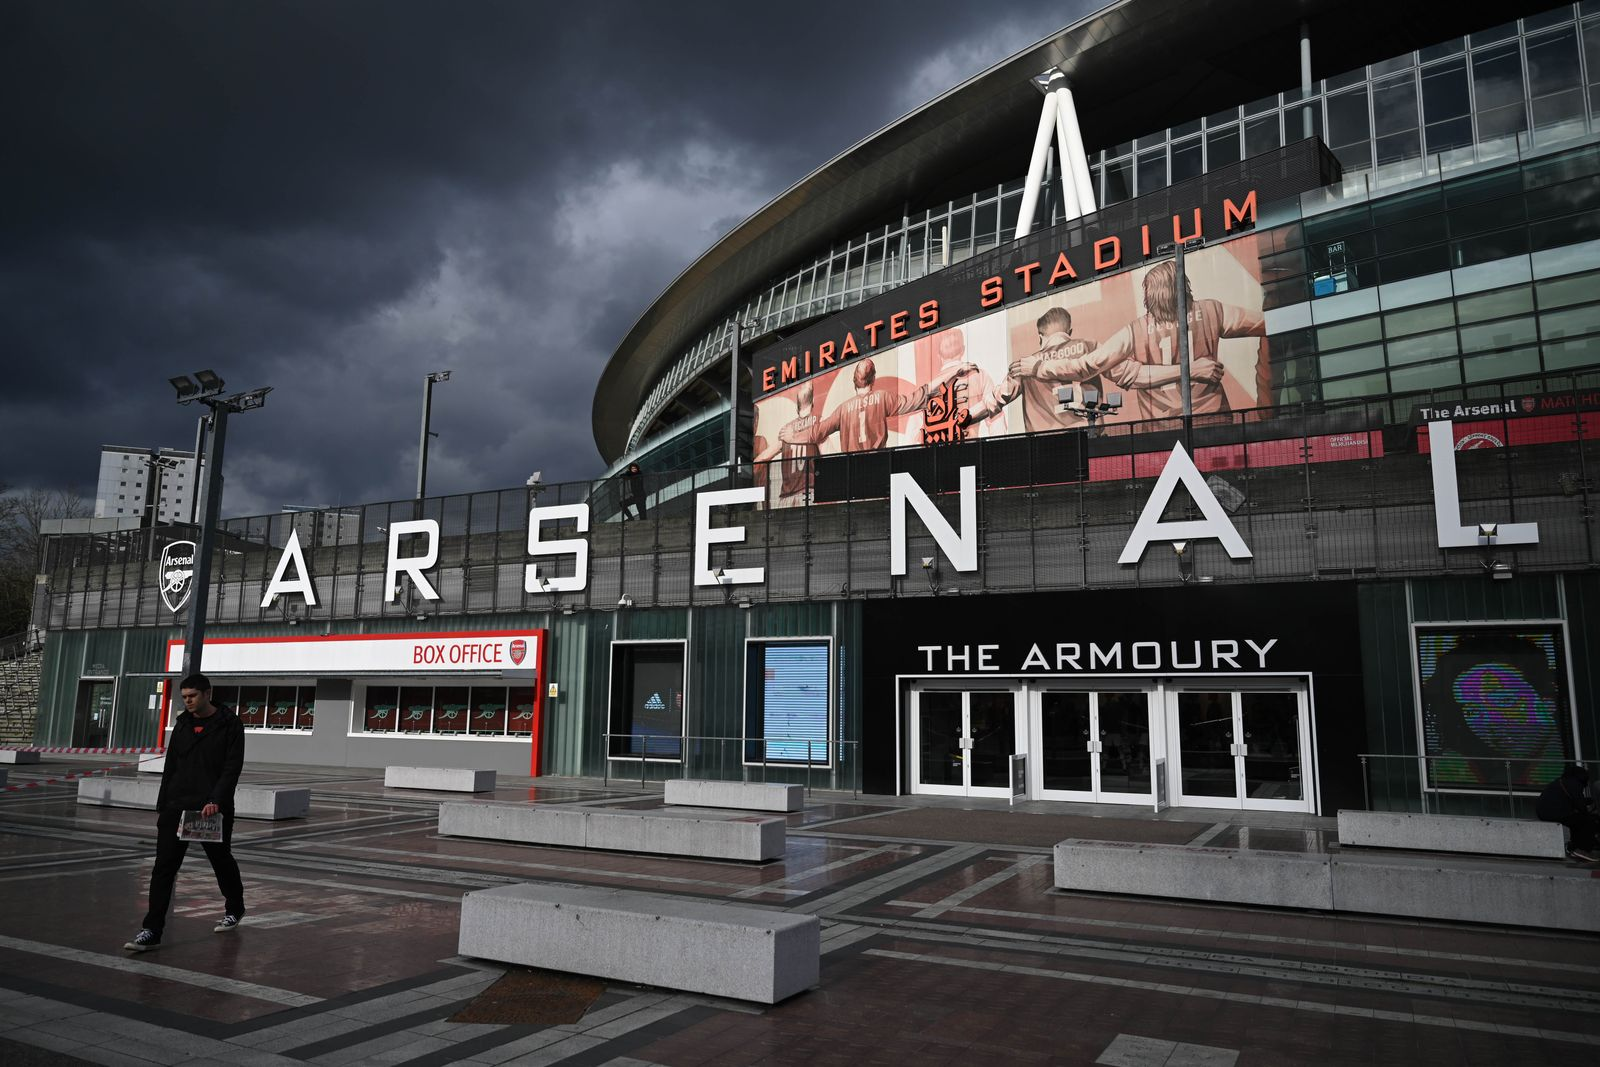 Premier League soccer games postponed, London, United Kingdom - 14 Mar 2020